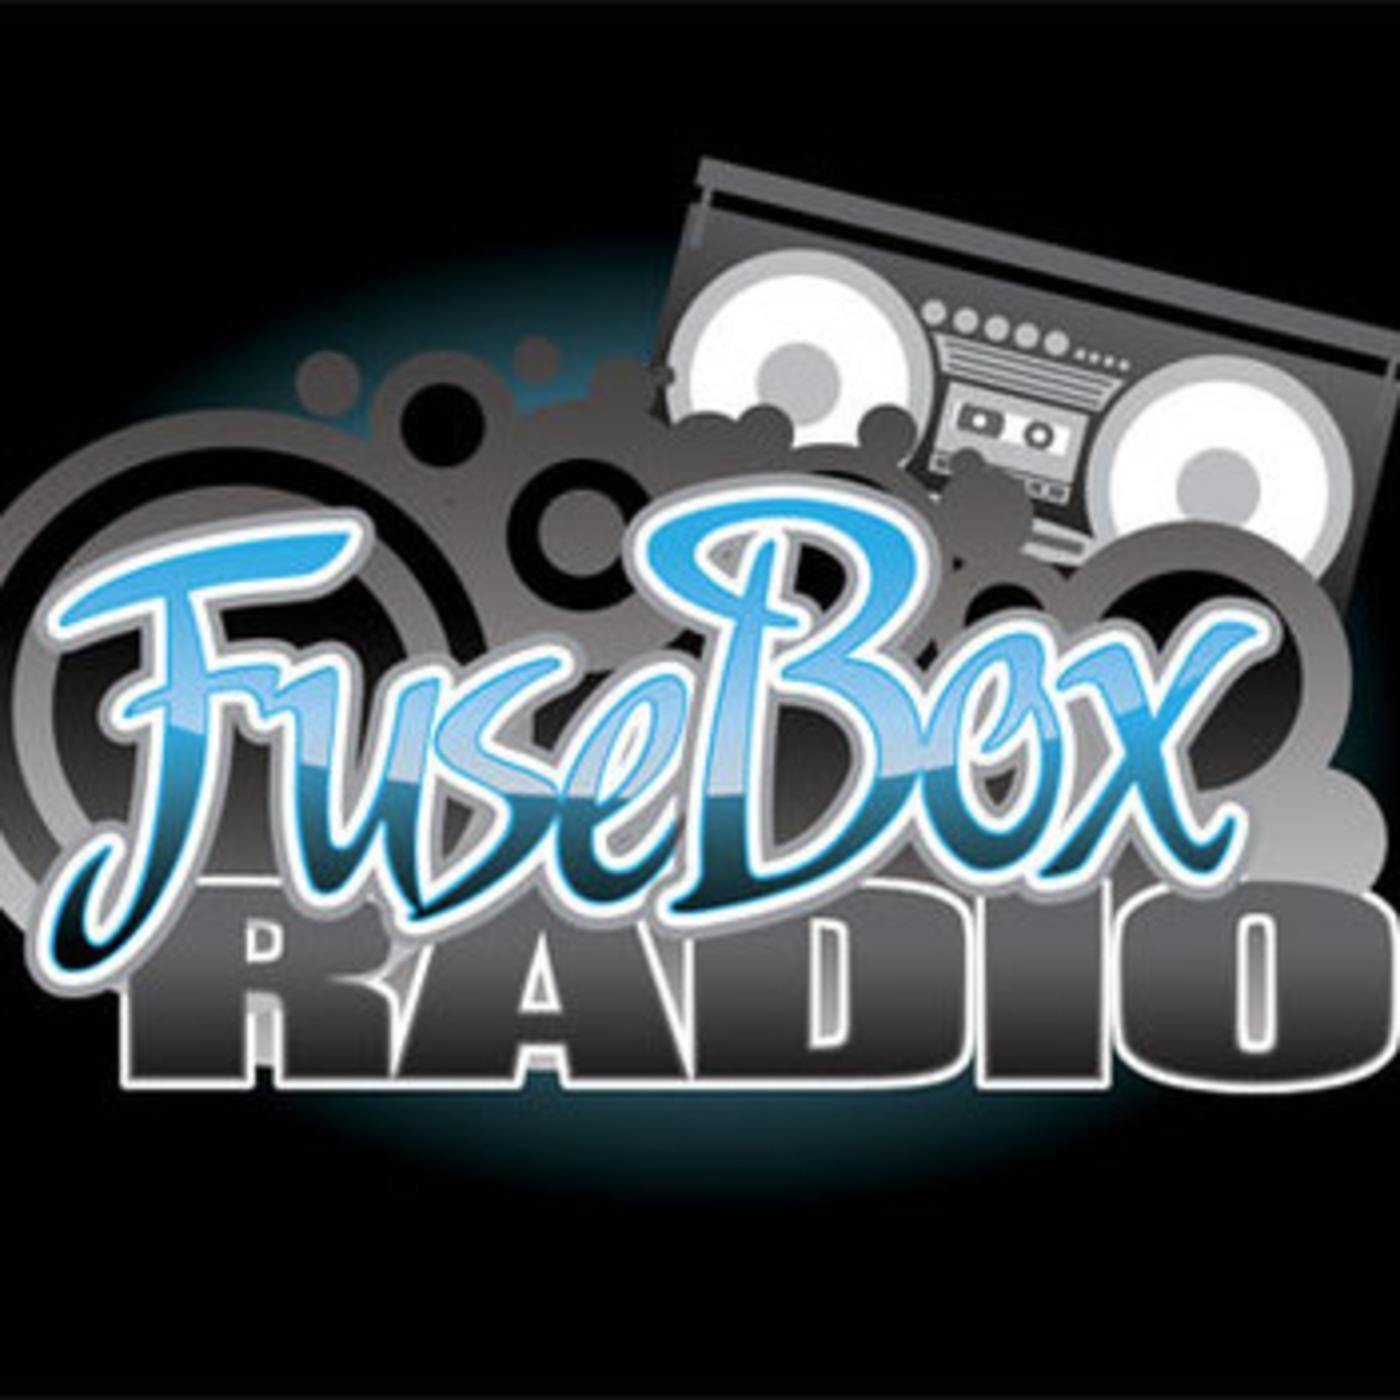 Fusebox Radio Broadcast W Dj Fusion Jon Judah 242 Jan 26 2011 Fuse Box Itunes Pic